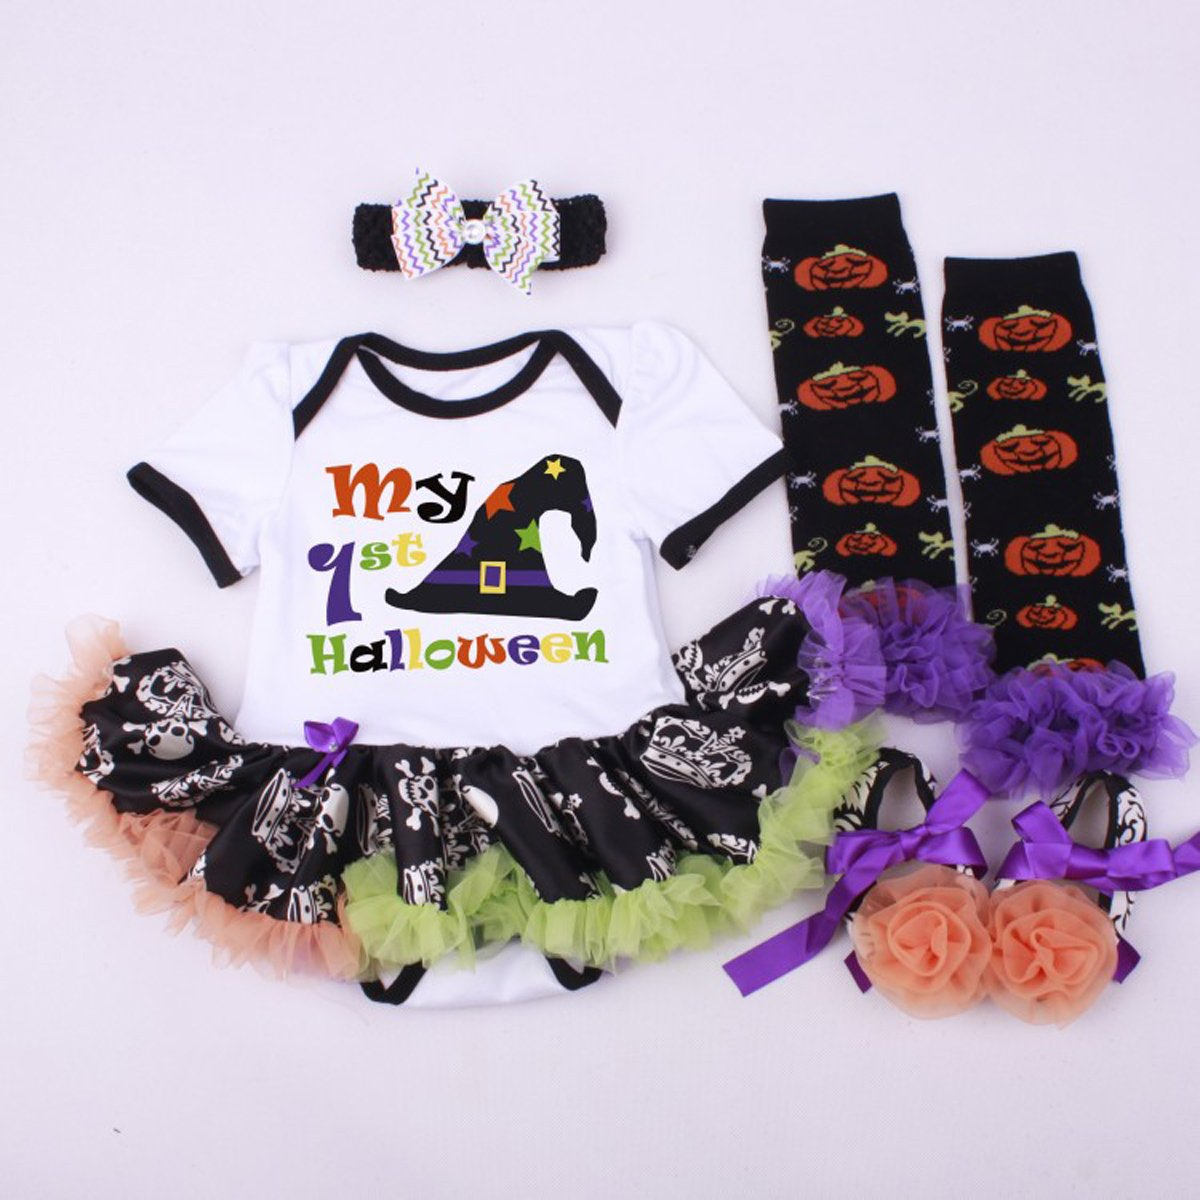 Marlegard Baby Girls 4PCs My 1st Halloween Hat Dress Headband Shoes Leg Warmers